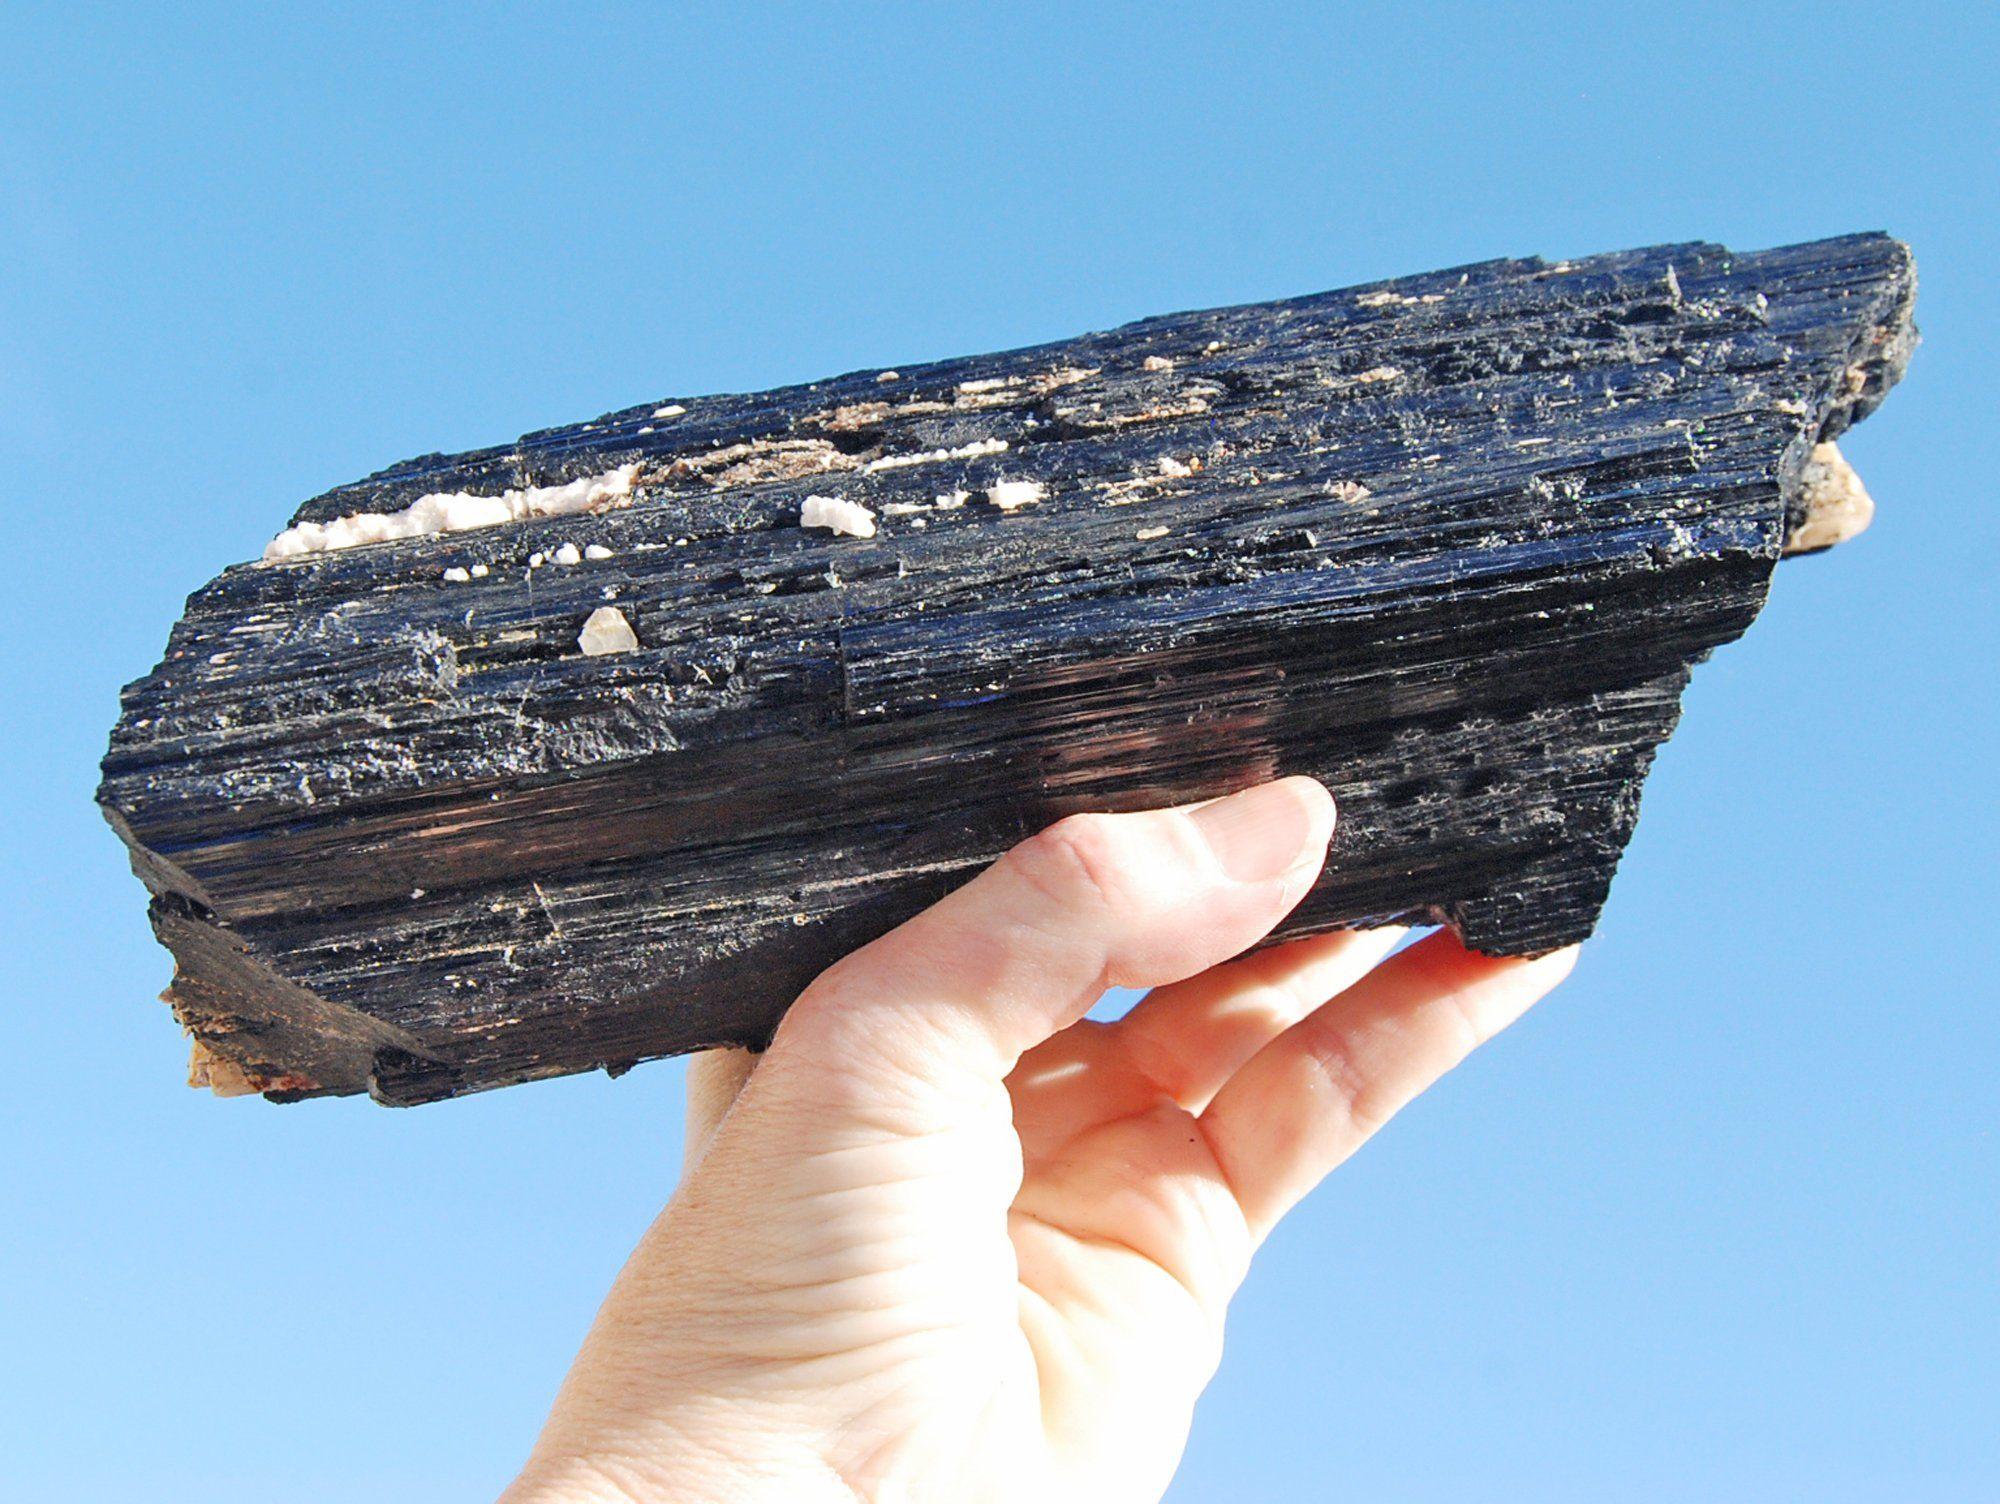 Black Tourmaline Crystal With Stand 4lbs Black Tourmaline